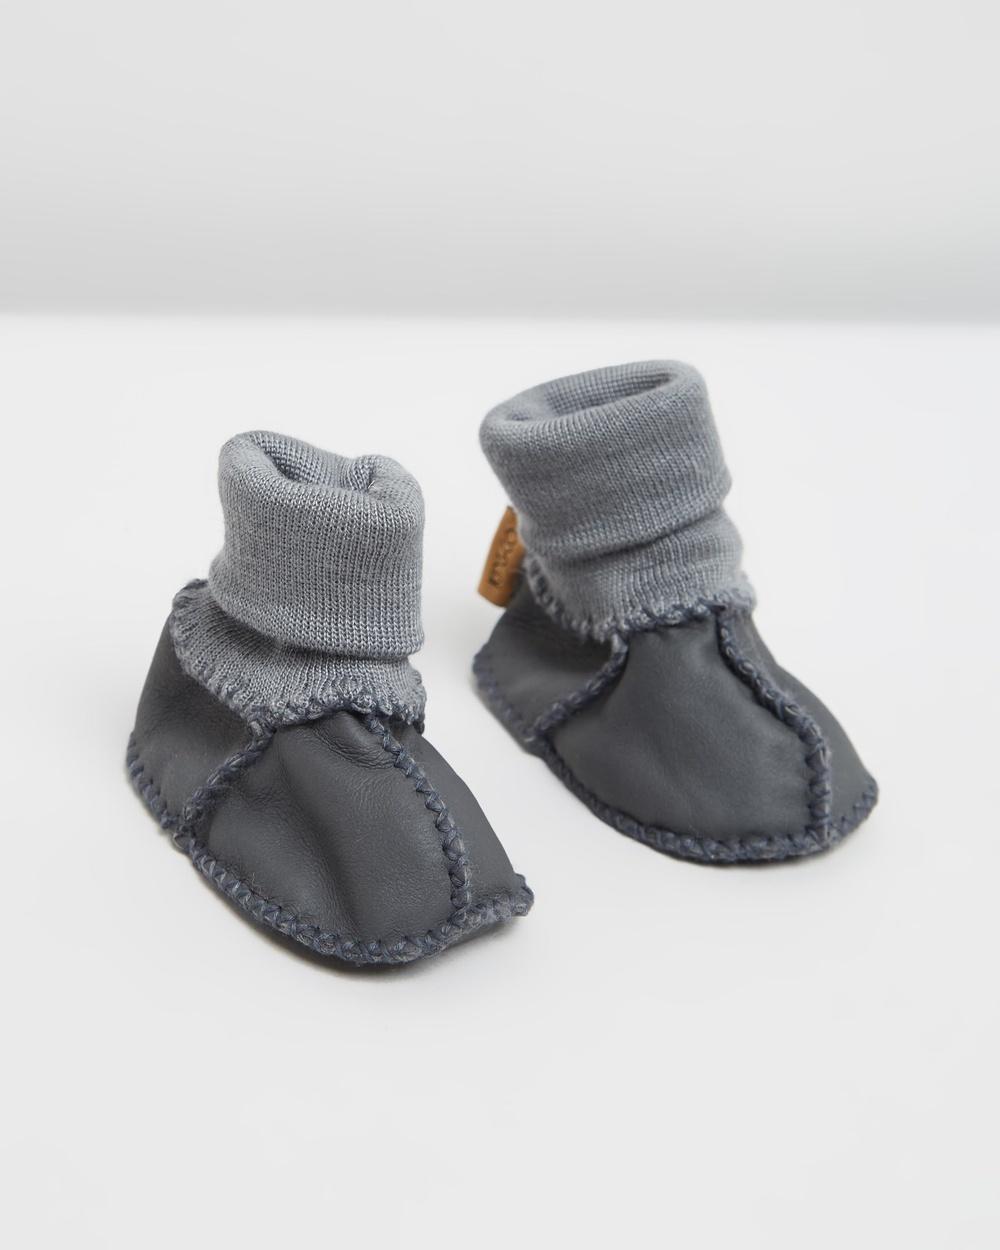 Kip&Co Sheepskin Booties Socks Dark Grey